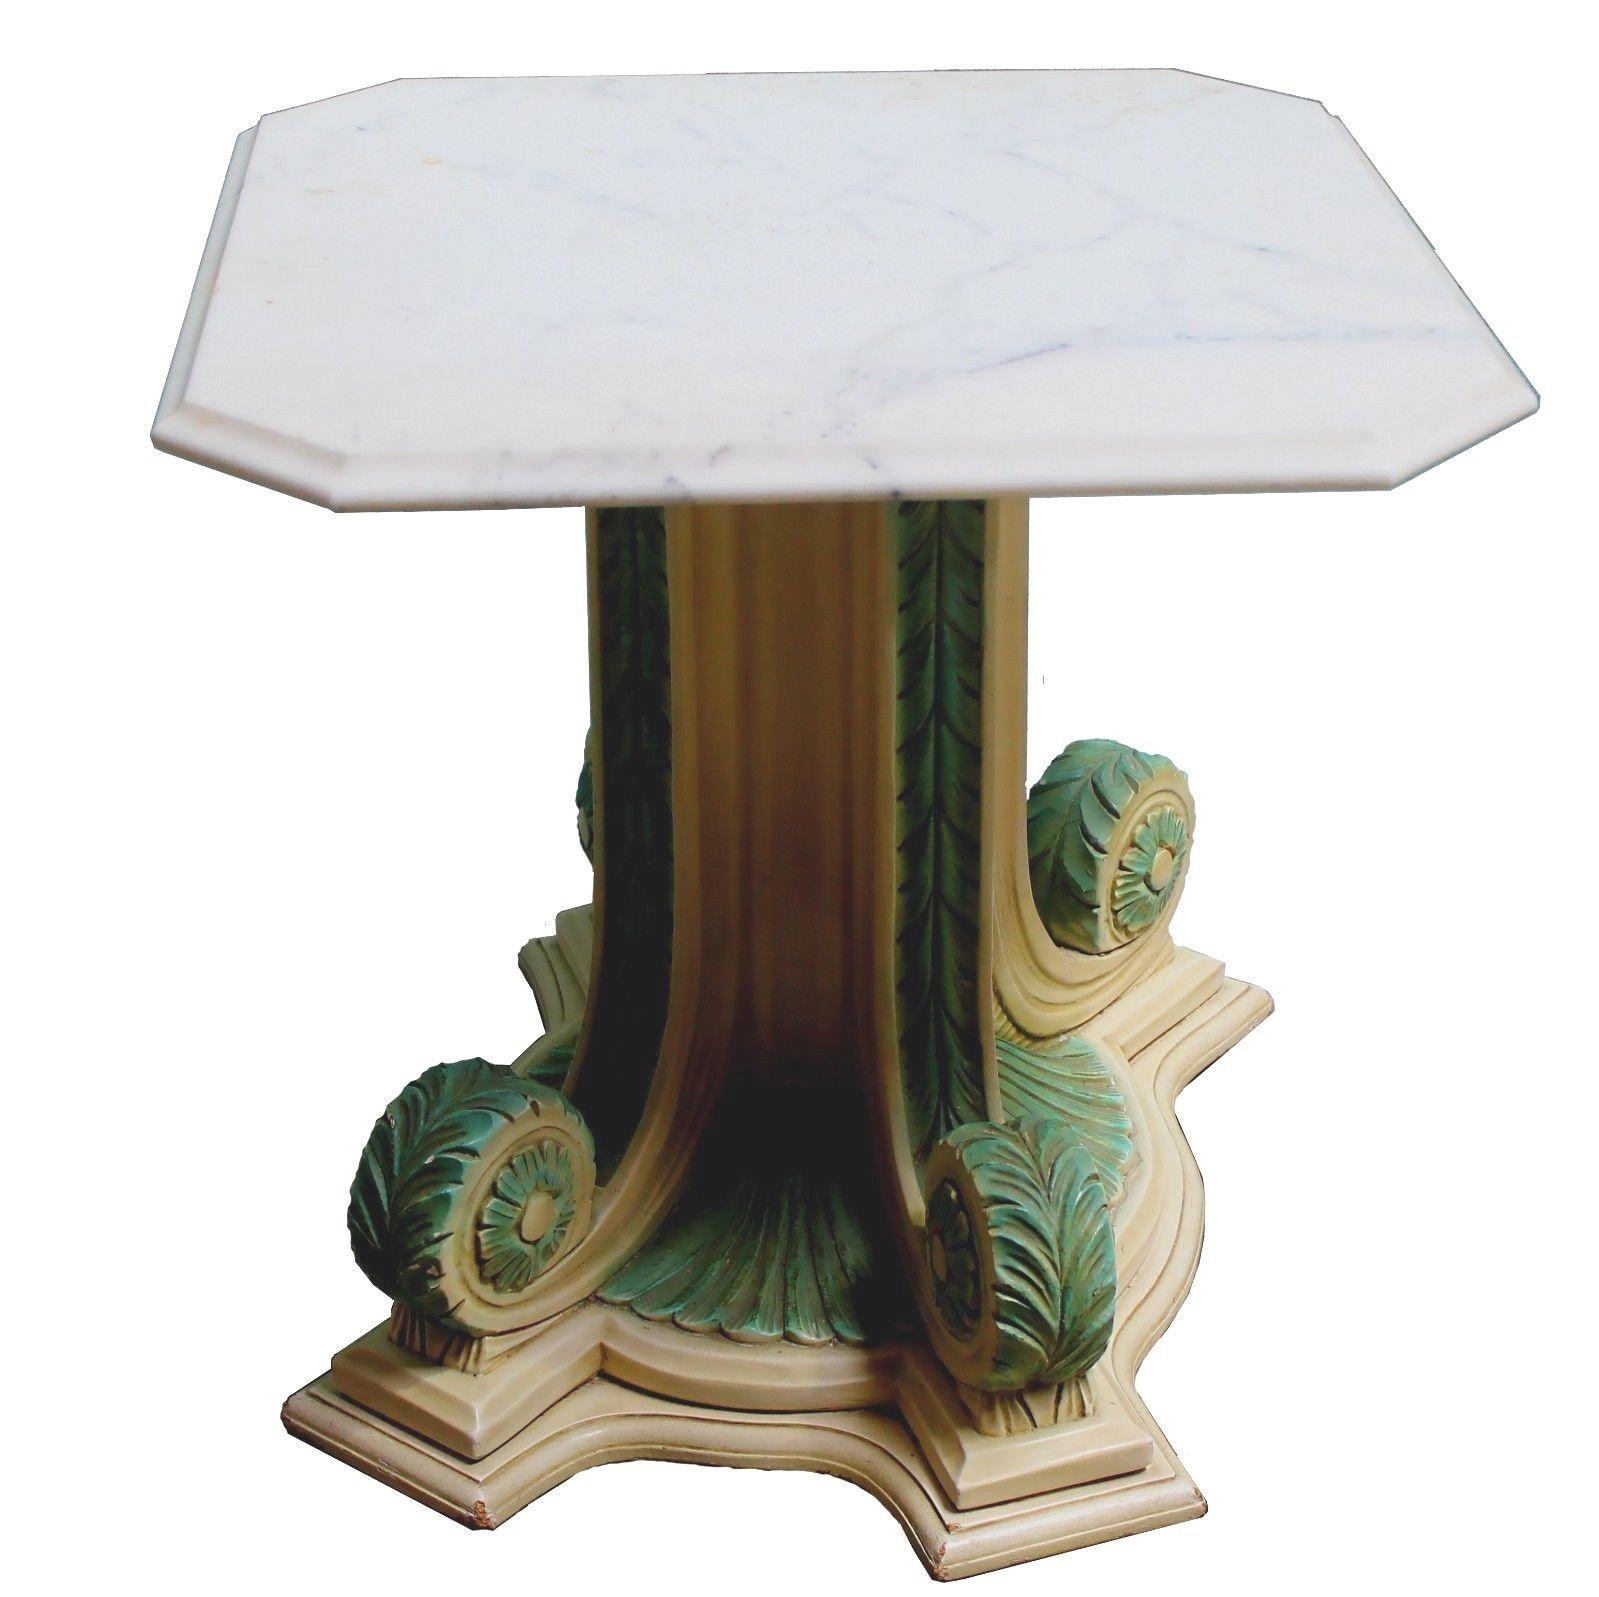 Vintage Neoclical Pedestal Marble Top Side Table